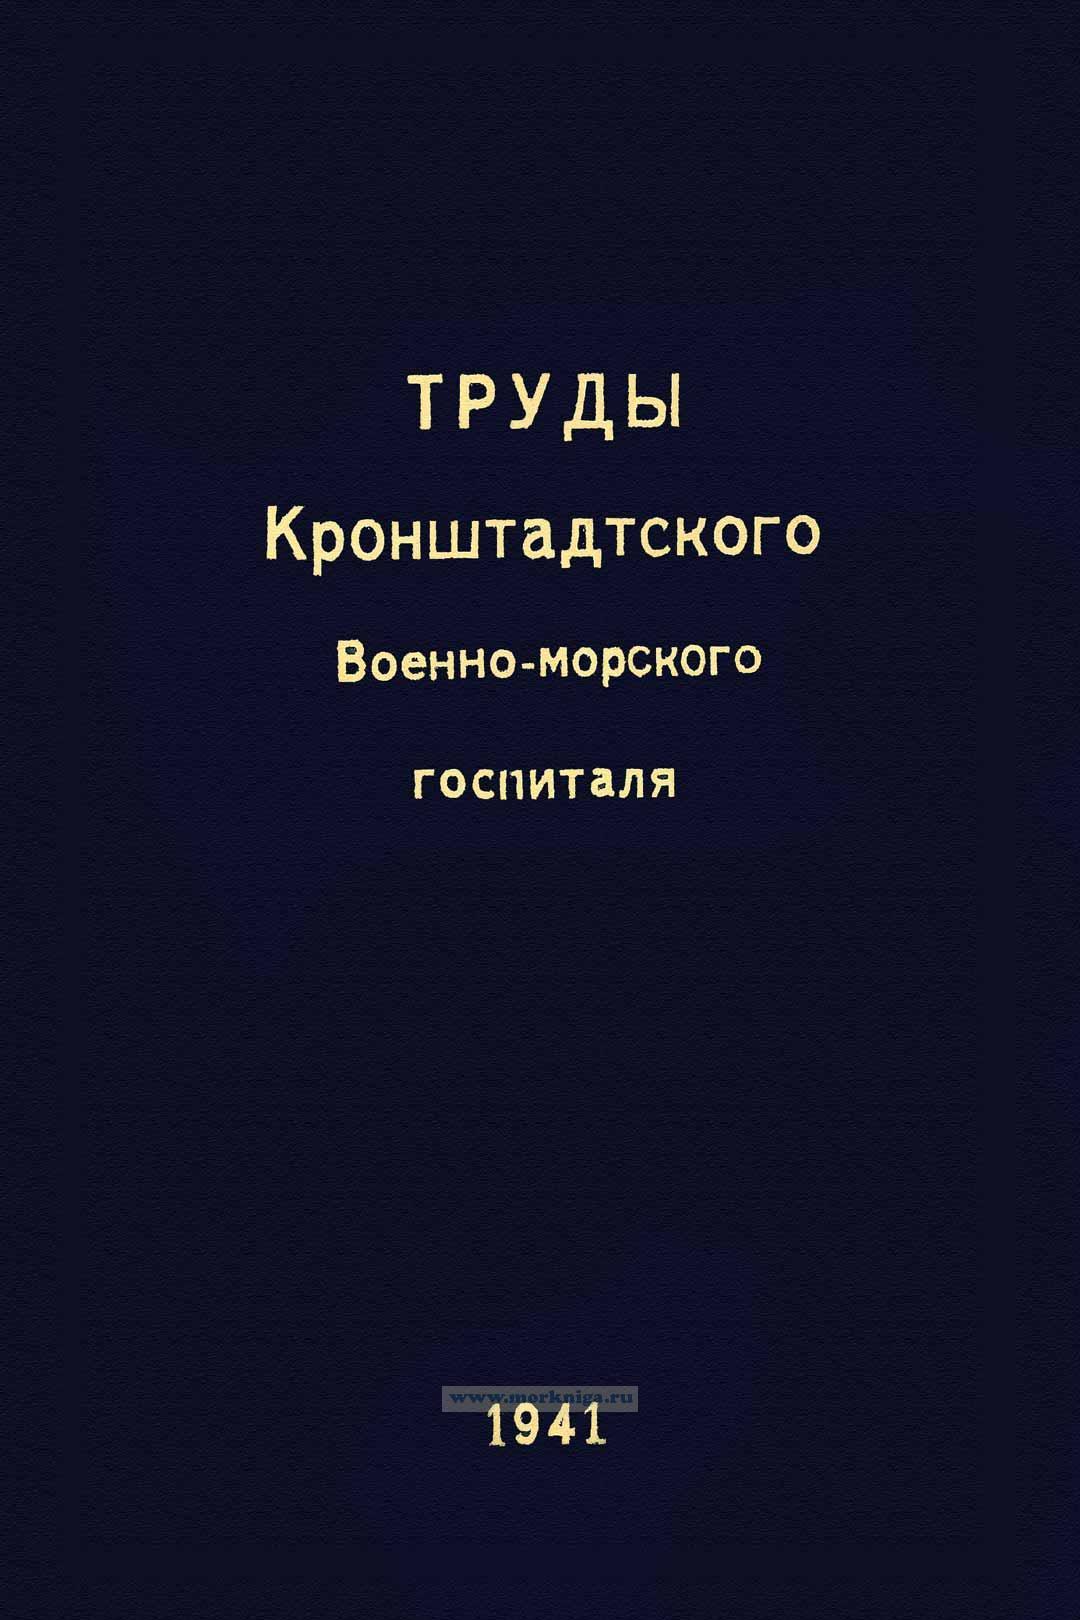 Труды Кронштадтского Военно-морского госпиталя